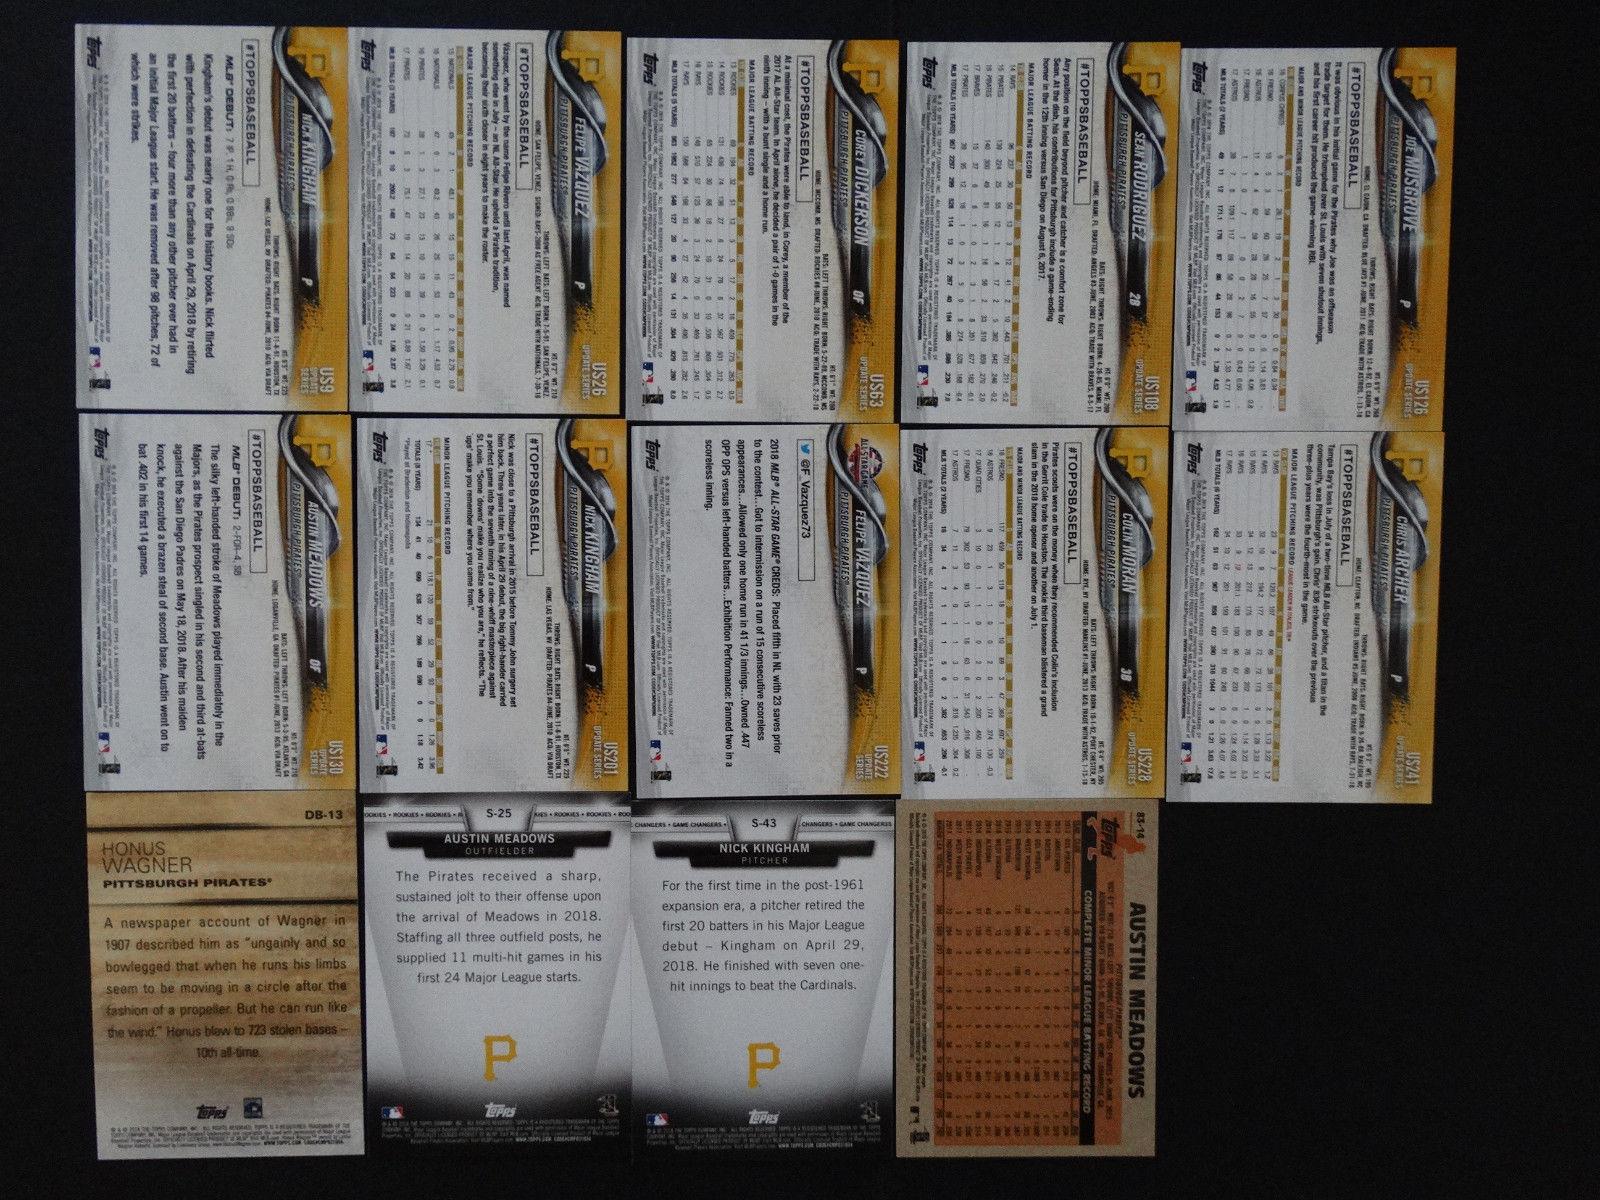 2018 Topps Update Pittsburgh Pirates Master Team Set 14 Baseball Cards Missing 1